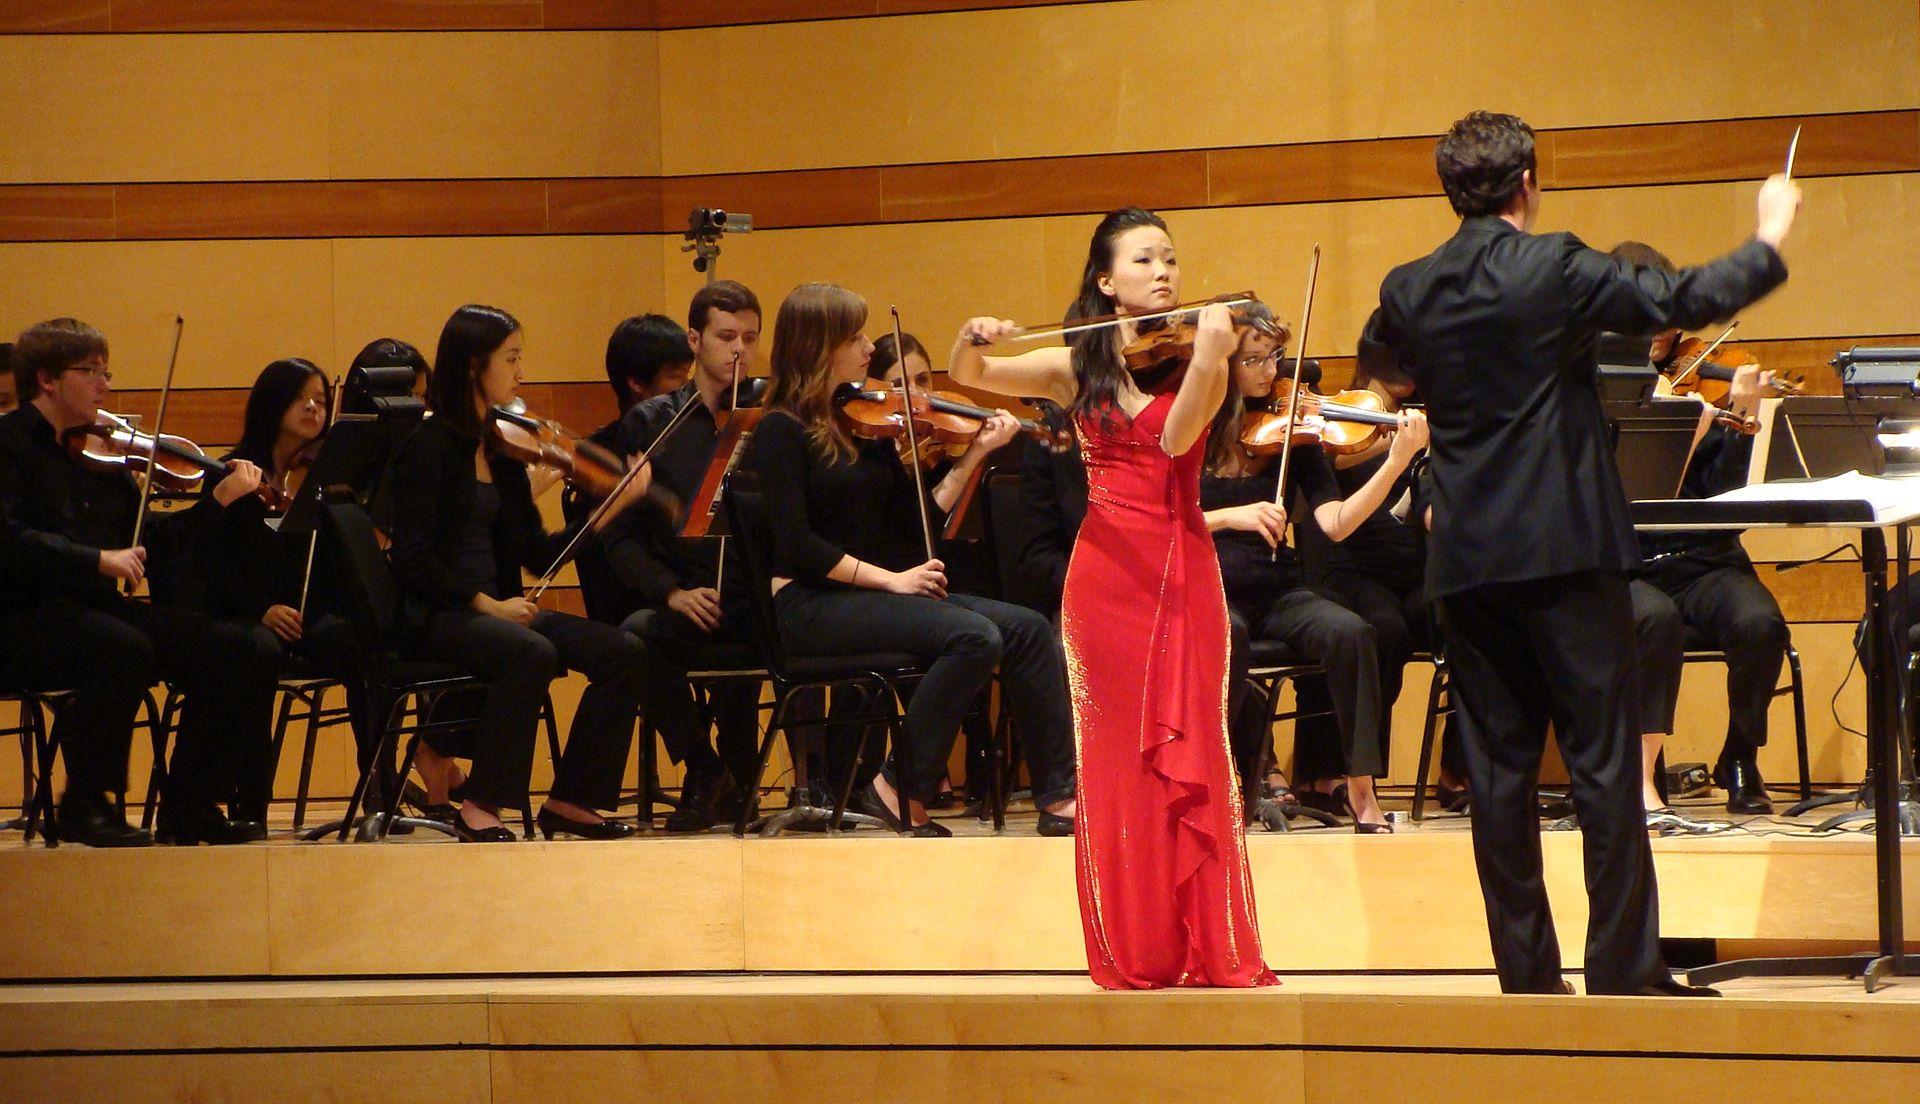 Performance at the Aspen Music Festival